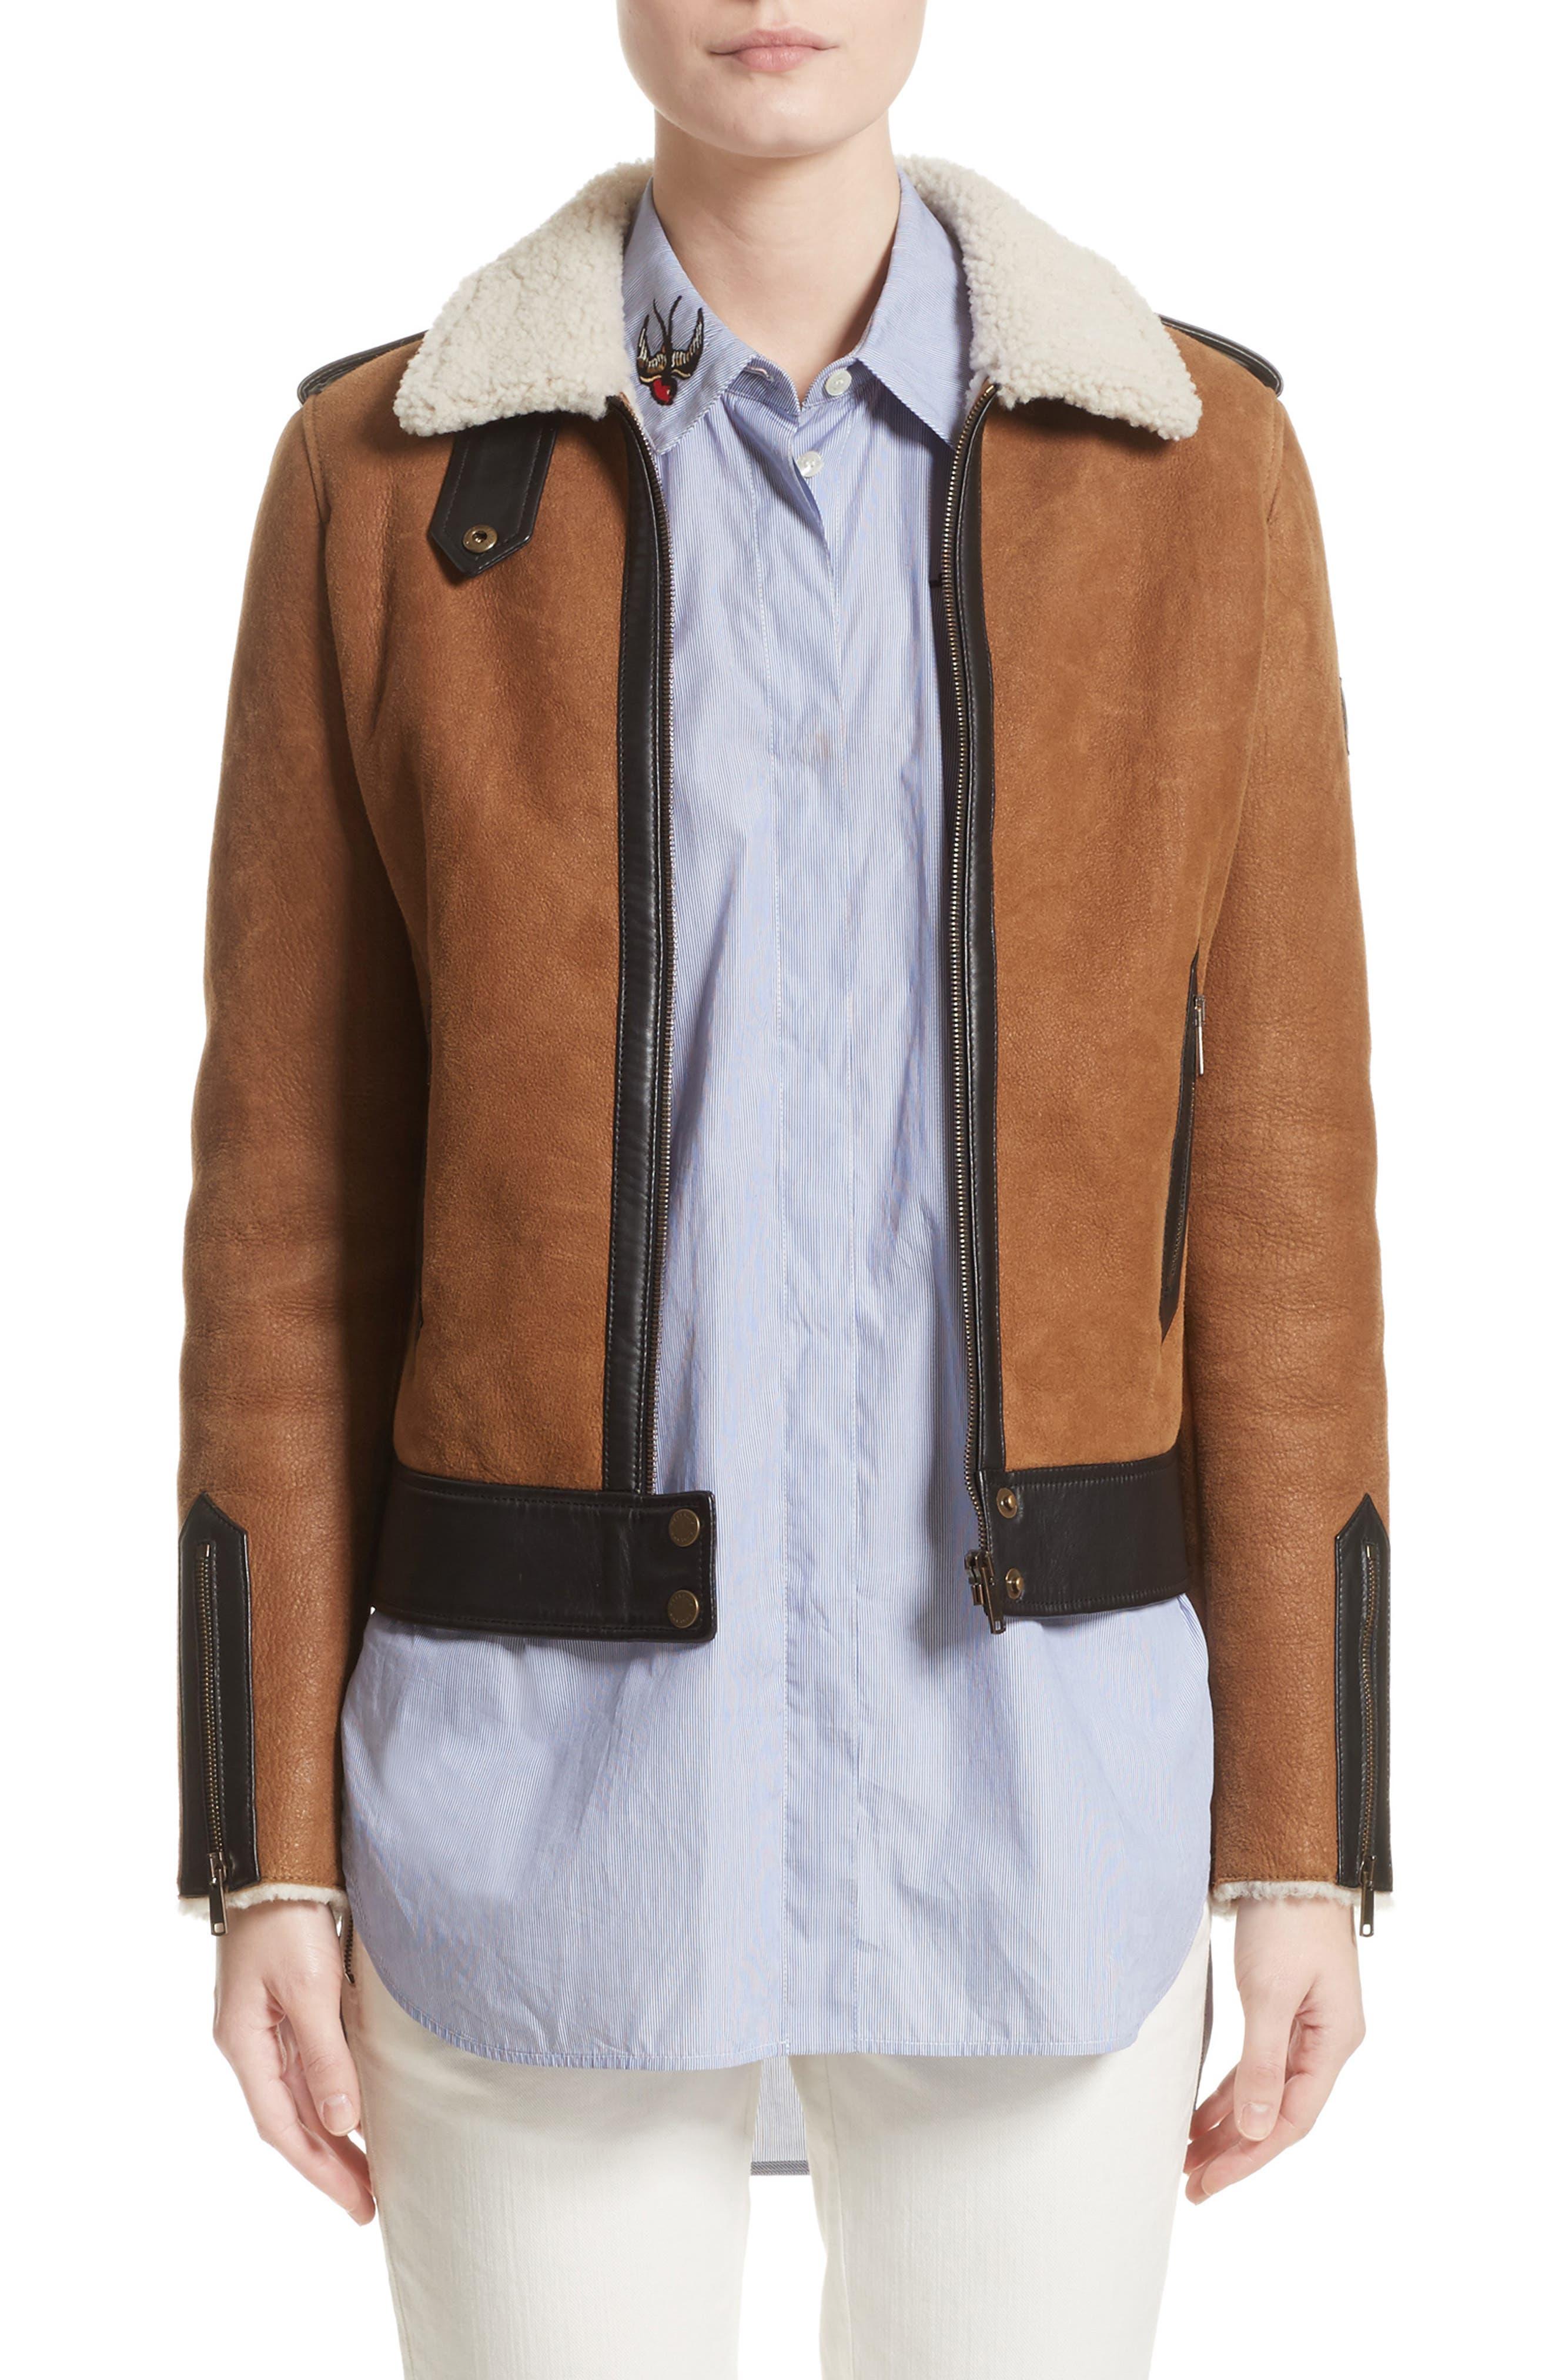 Main Image - Belstaff Danford Genuine Shearling Jacket